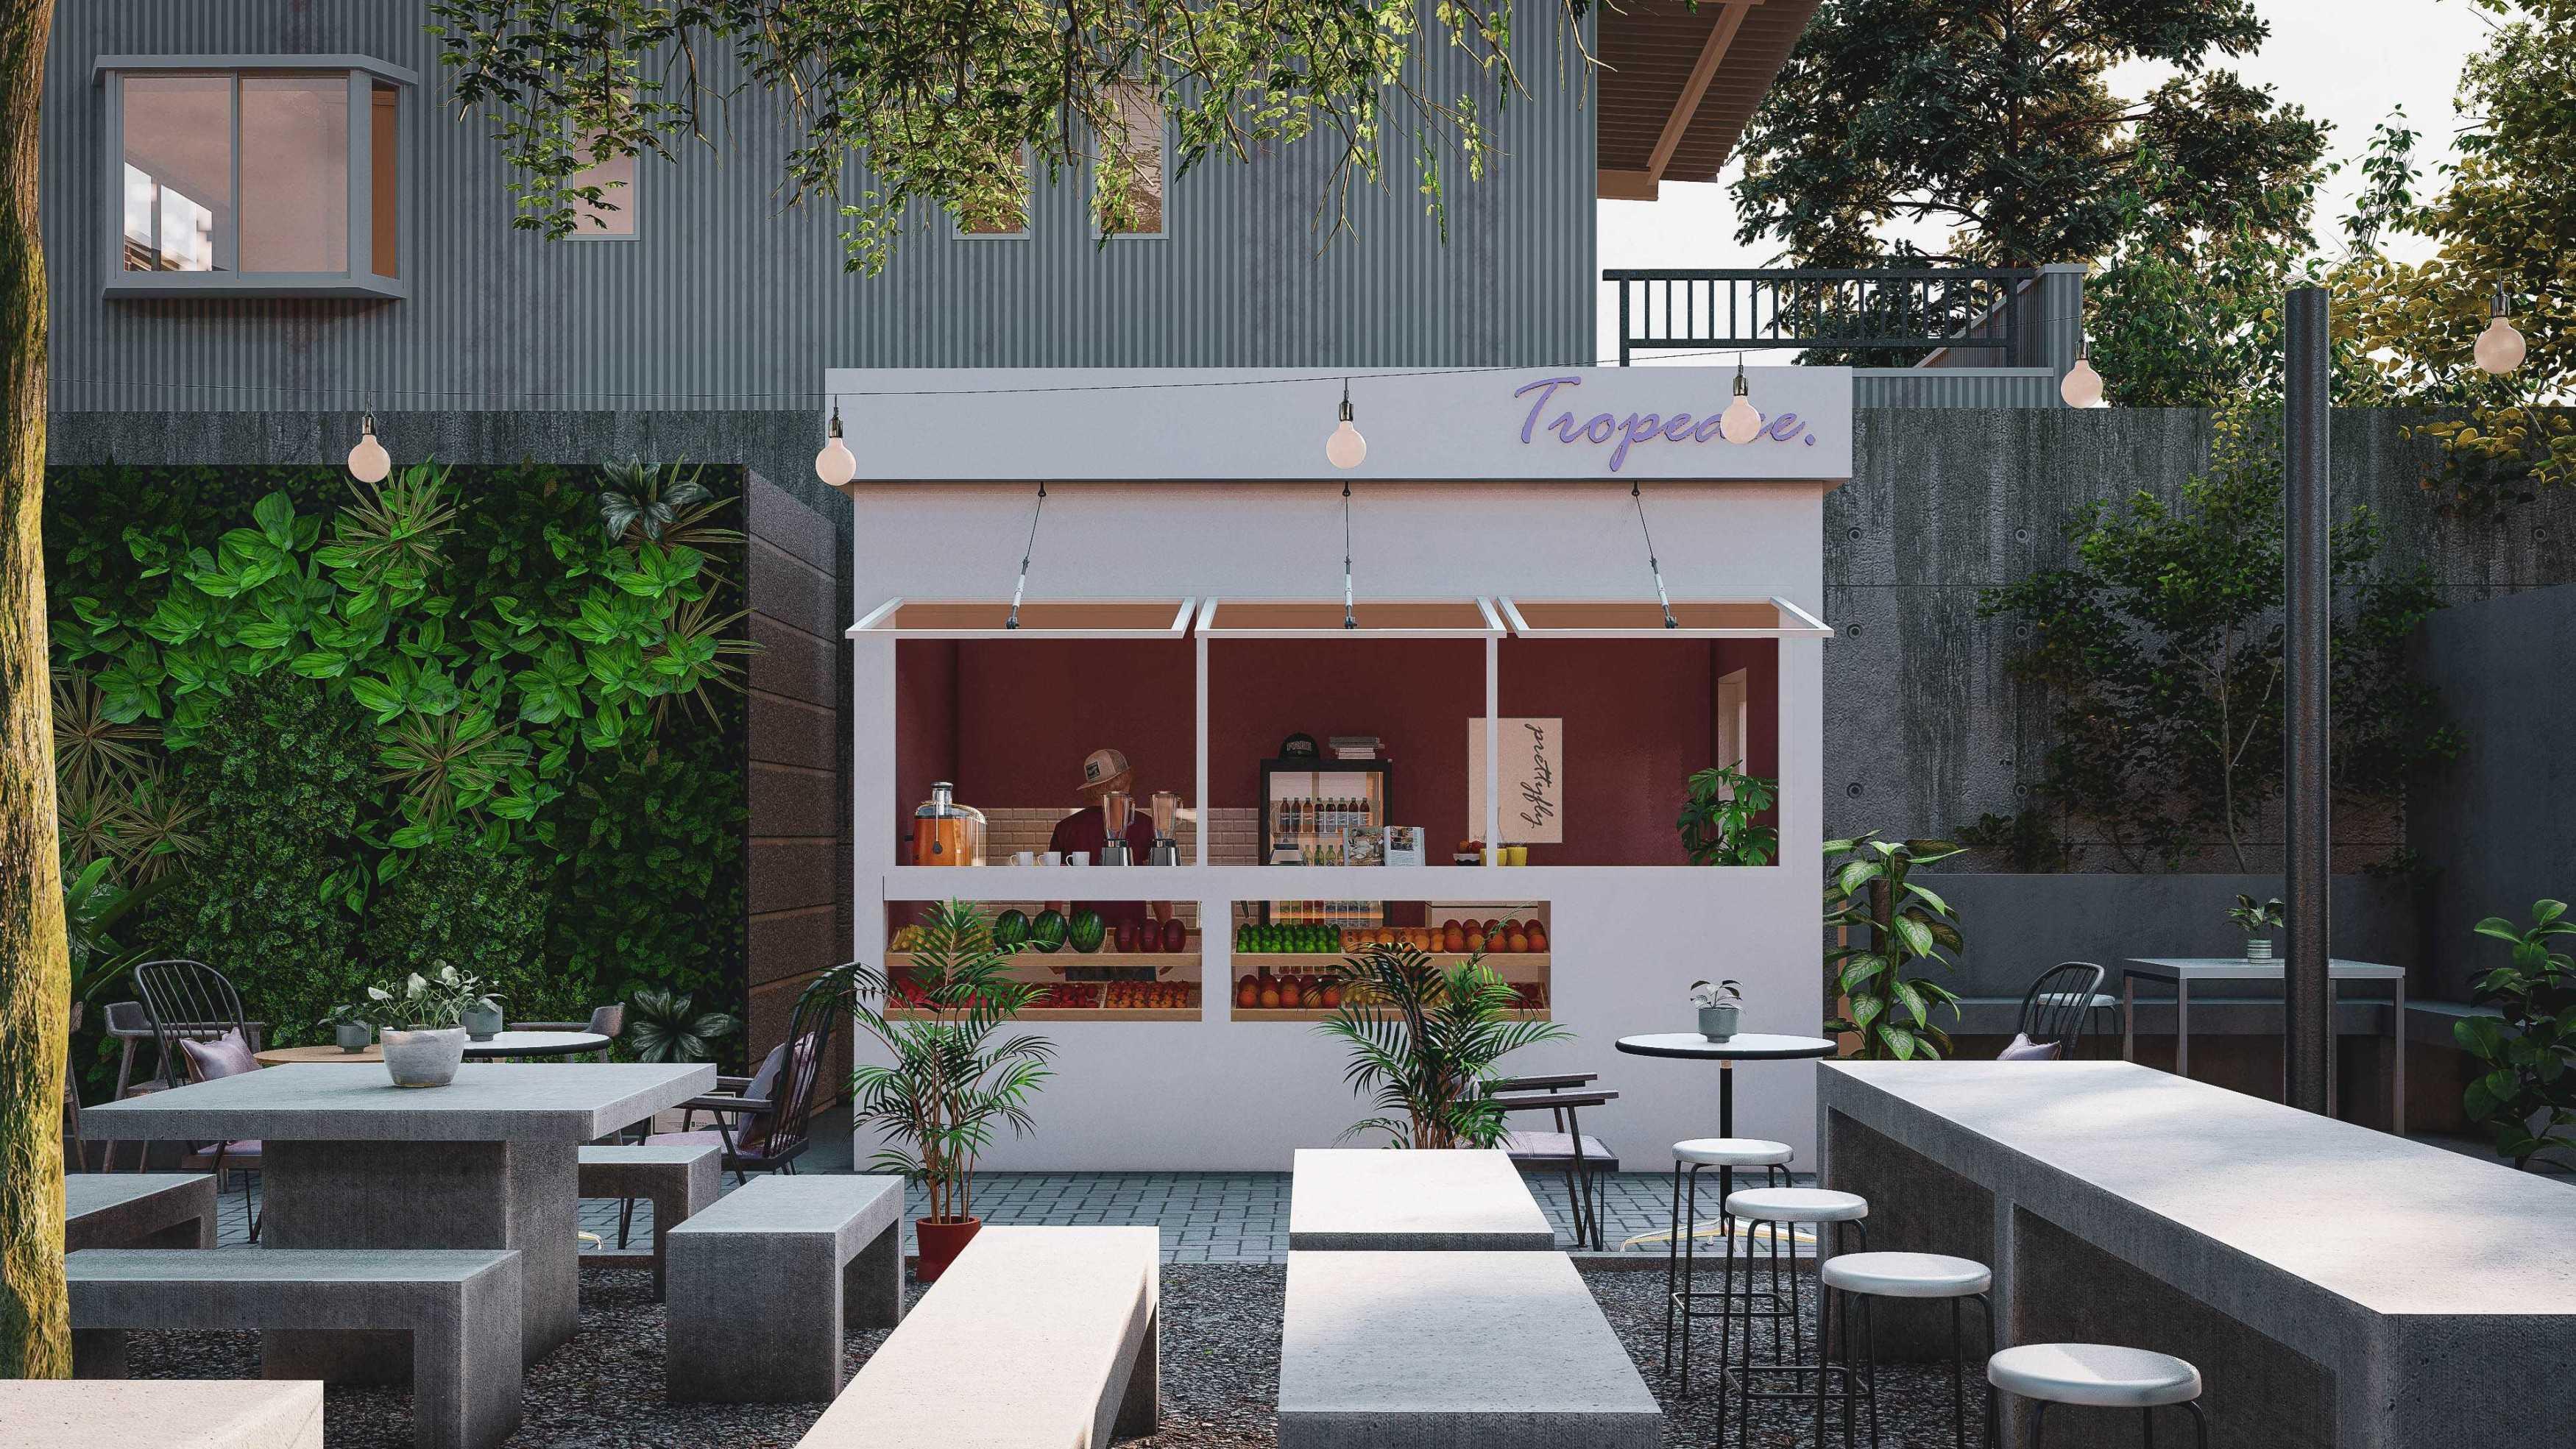 Lingkar Karya Tropeace Juice Bar Bogor, Jawa Barat, Indonesia Bogor, Jawa Barat, Indonesia Lingkar-Karya-Tropeace-Juice-Bar   111838